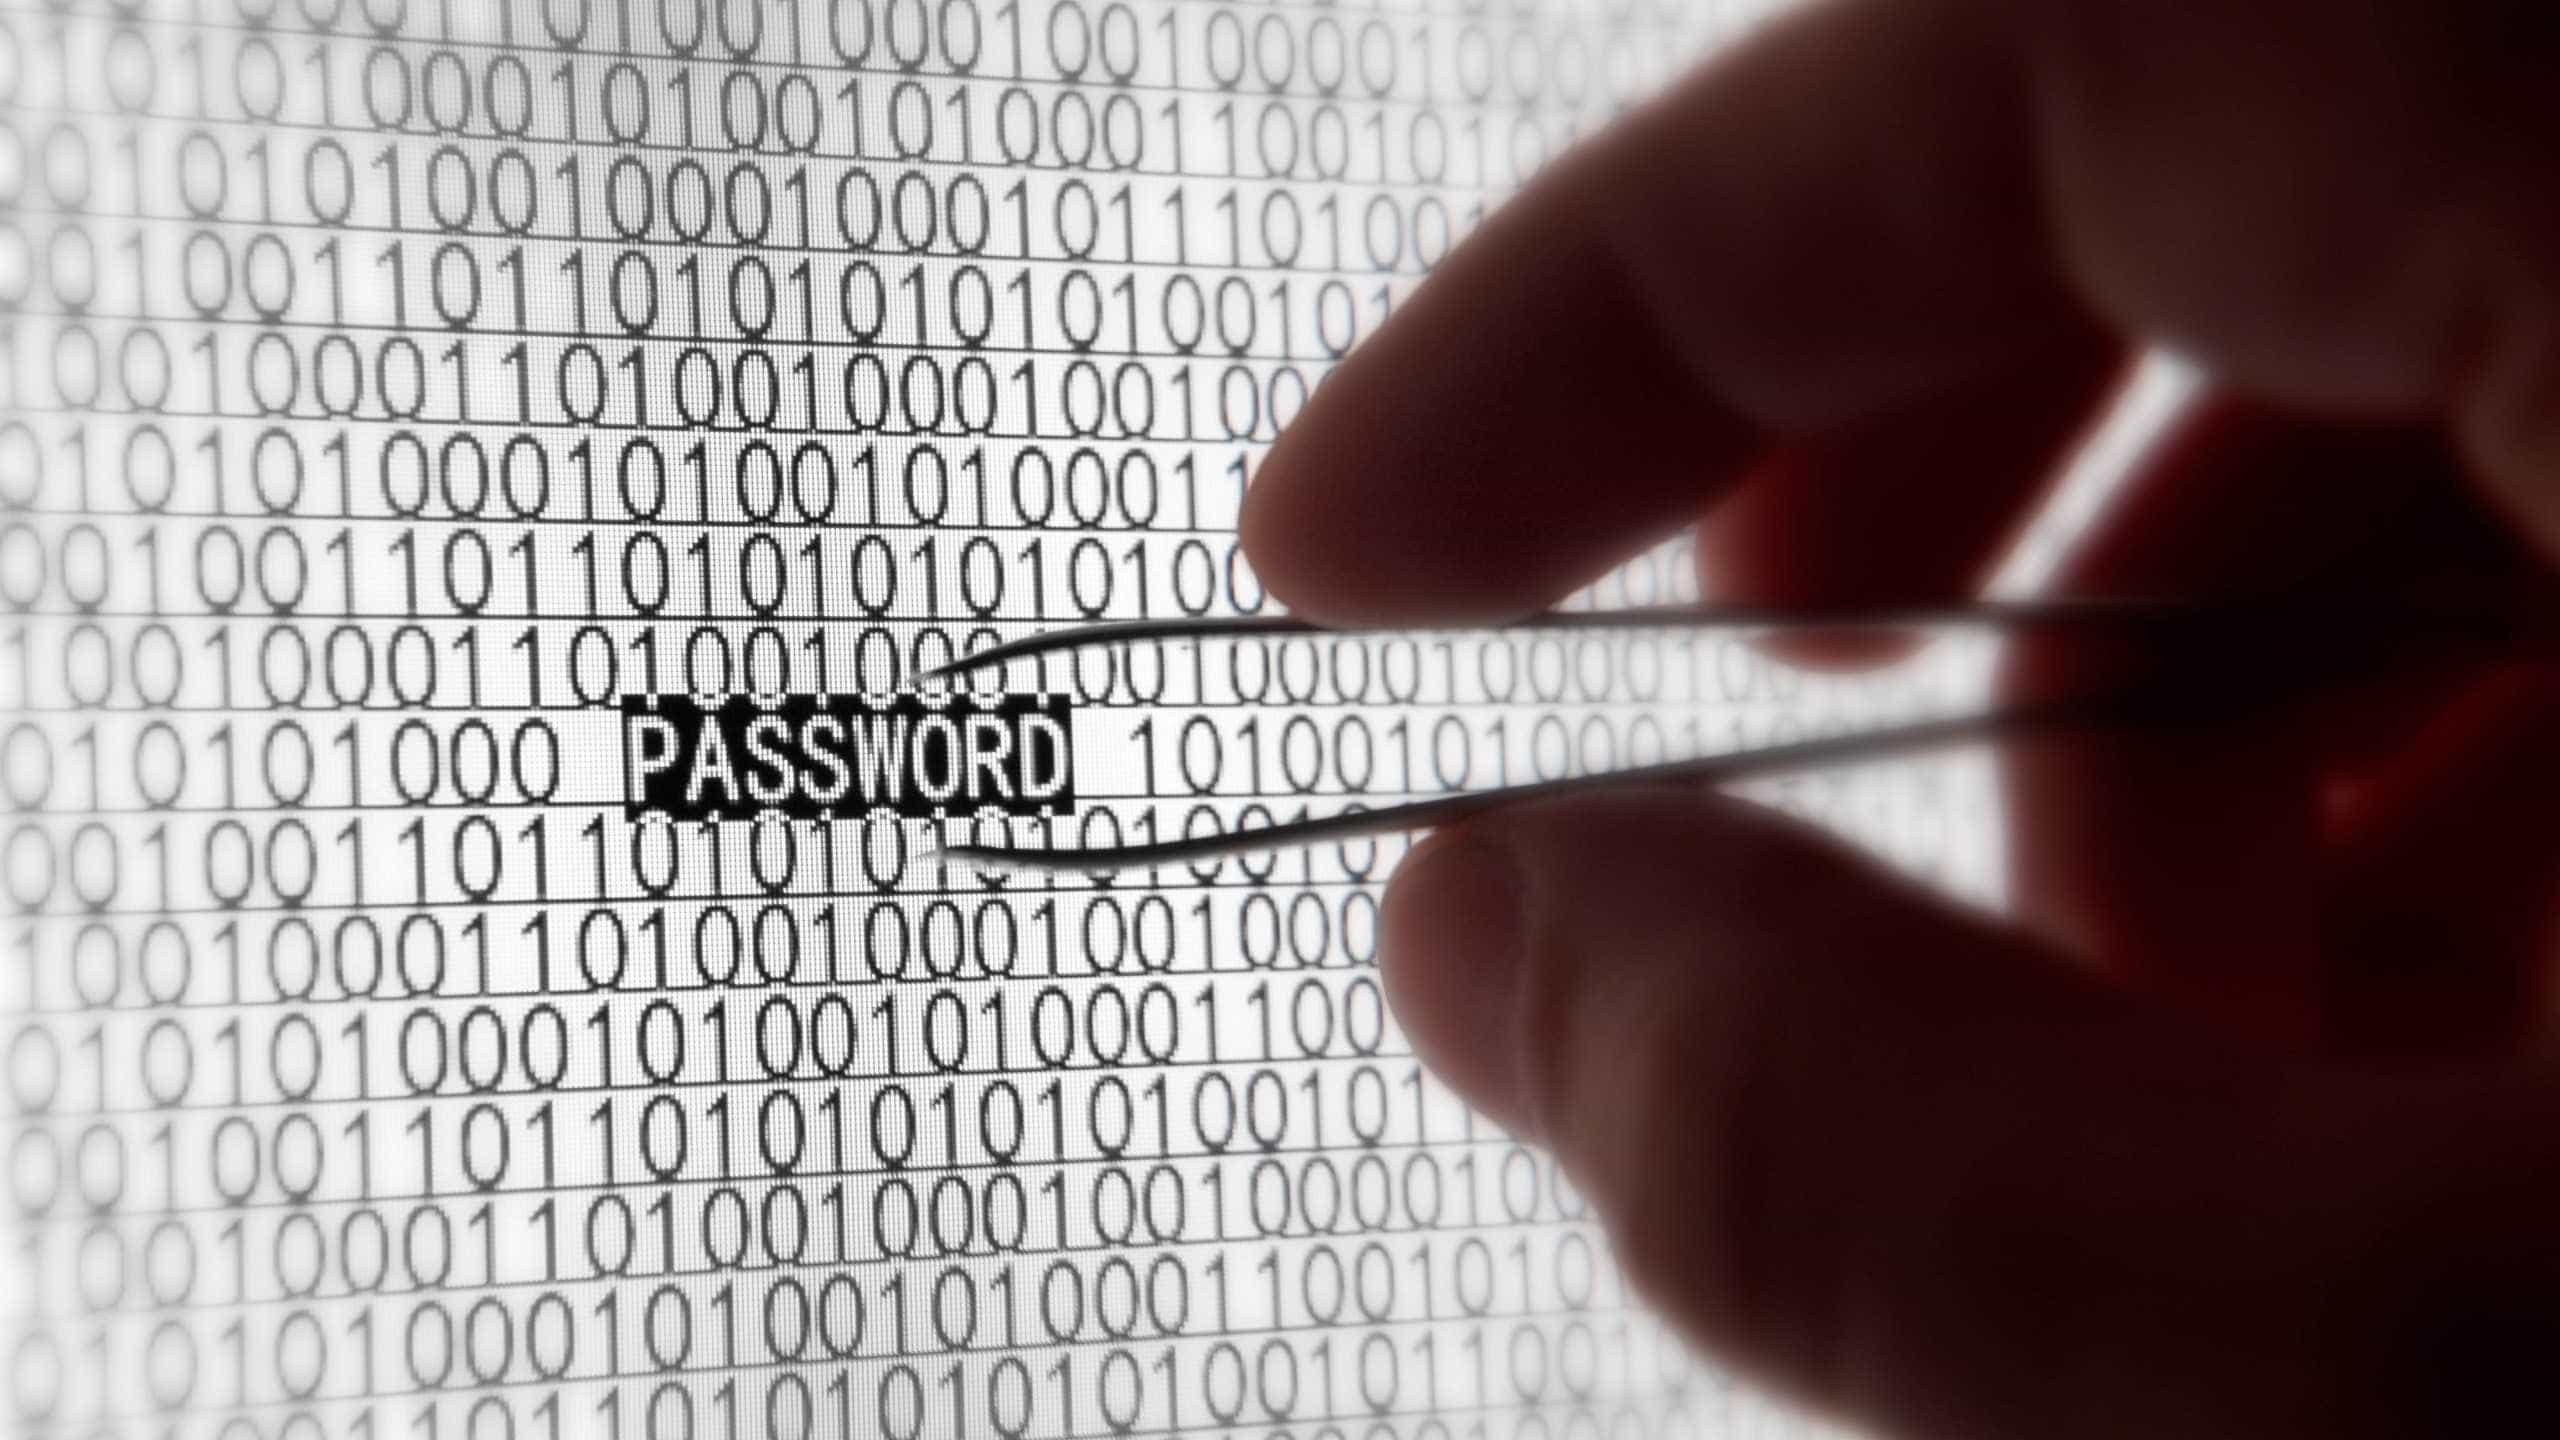 Hacker invade sistema de presídio e liberta colega